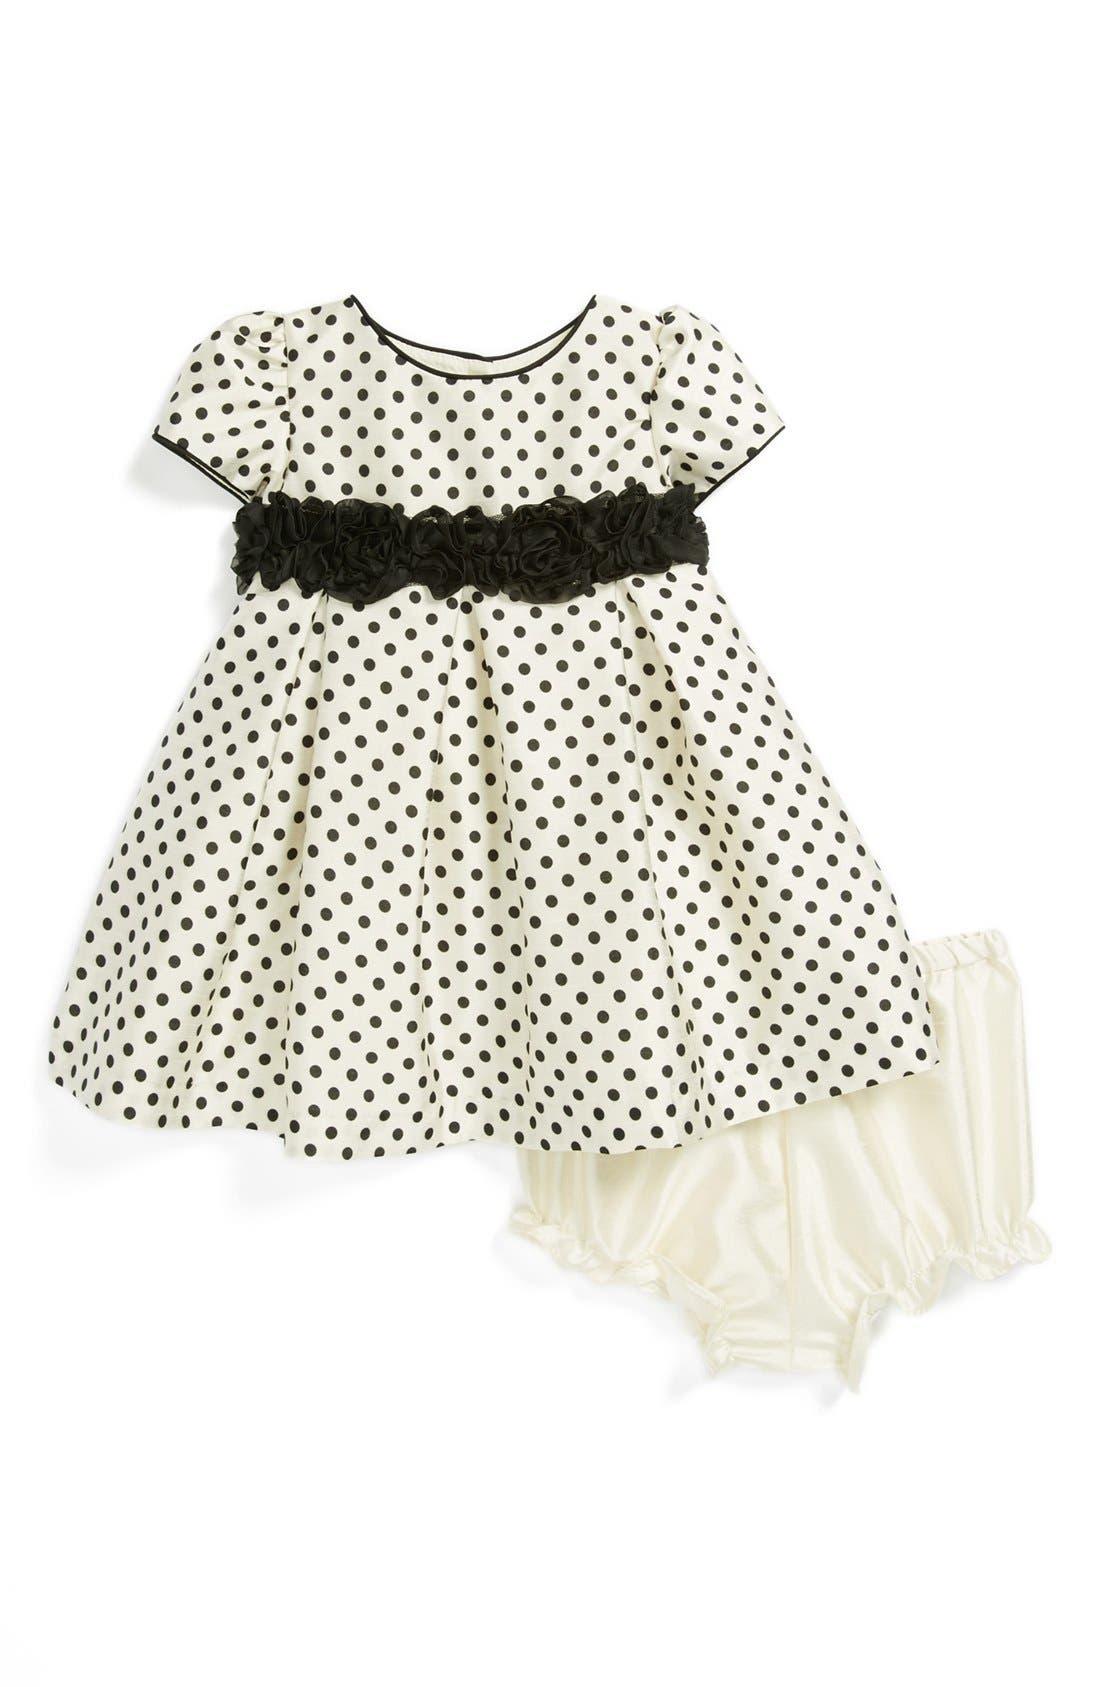 Main Image - Pippa & Julie Dress & Bloomers (Baby Girls)